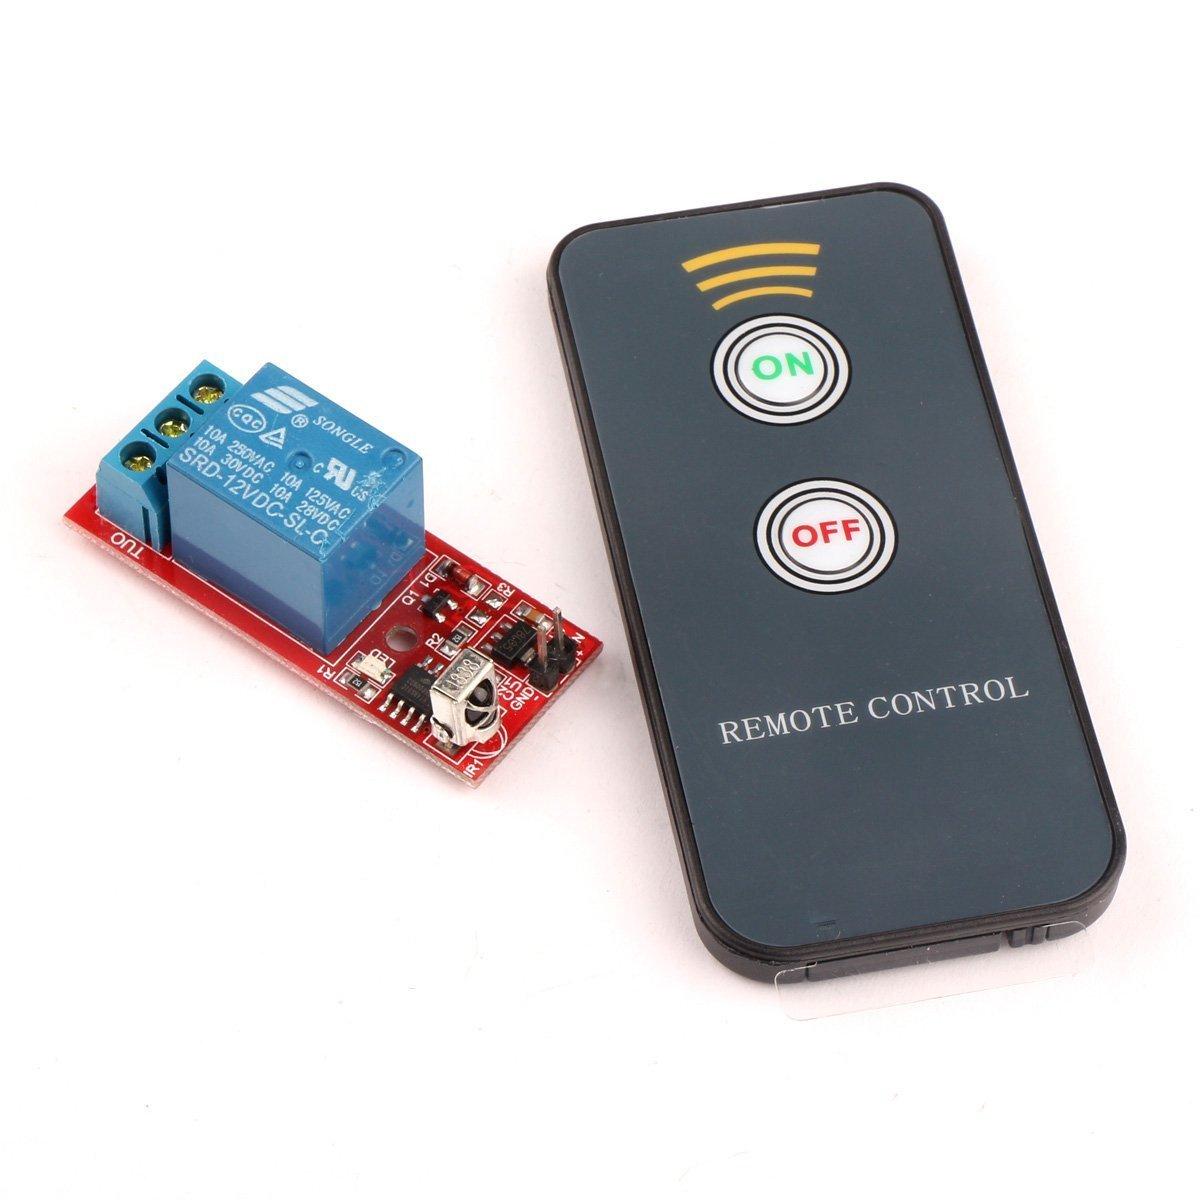 Droking Infrarot-Empf/änger Relais-Treiberplatine Fernbedienung 8M Wireless Controller LED Plattenplatine IR-Fernbedienung Schalter-1 12V Selbsthemmend